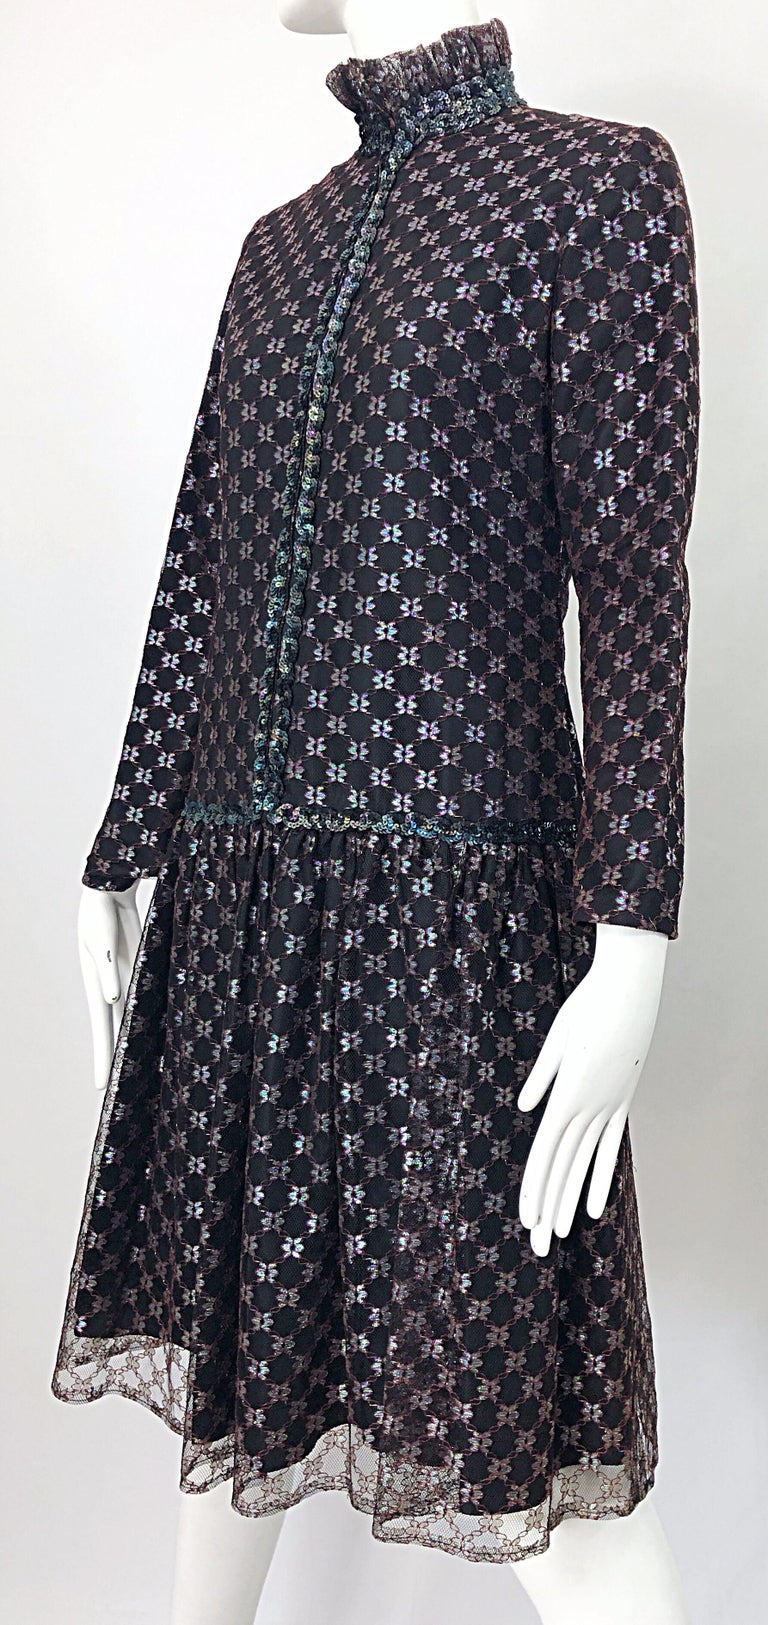 Oscar de la Renta 1970s Black + Burgundy Red Iridescent Sequin Drop Waist Dress For Sale 10